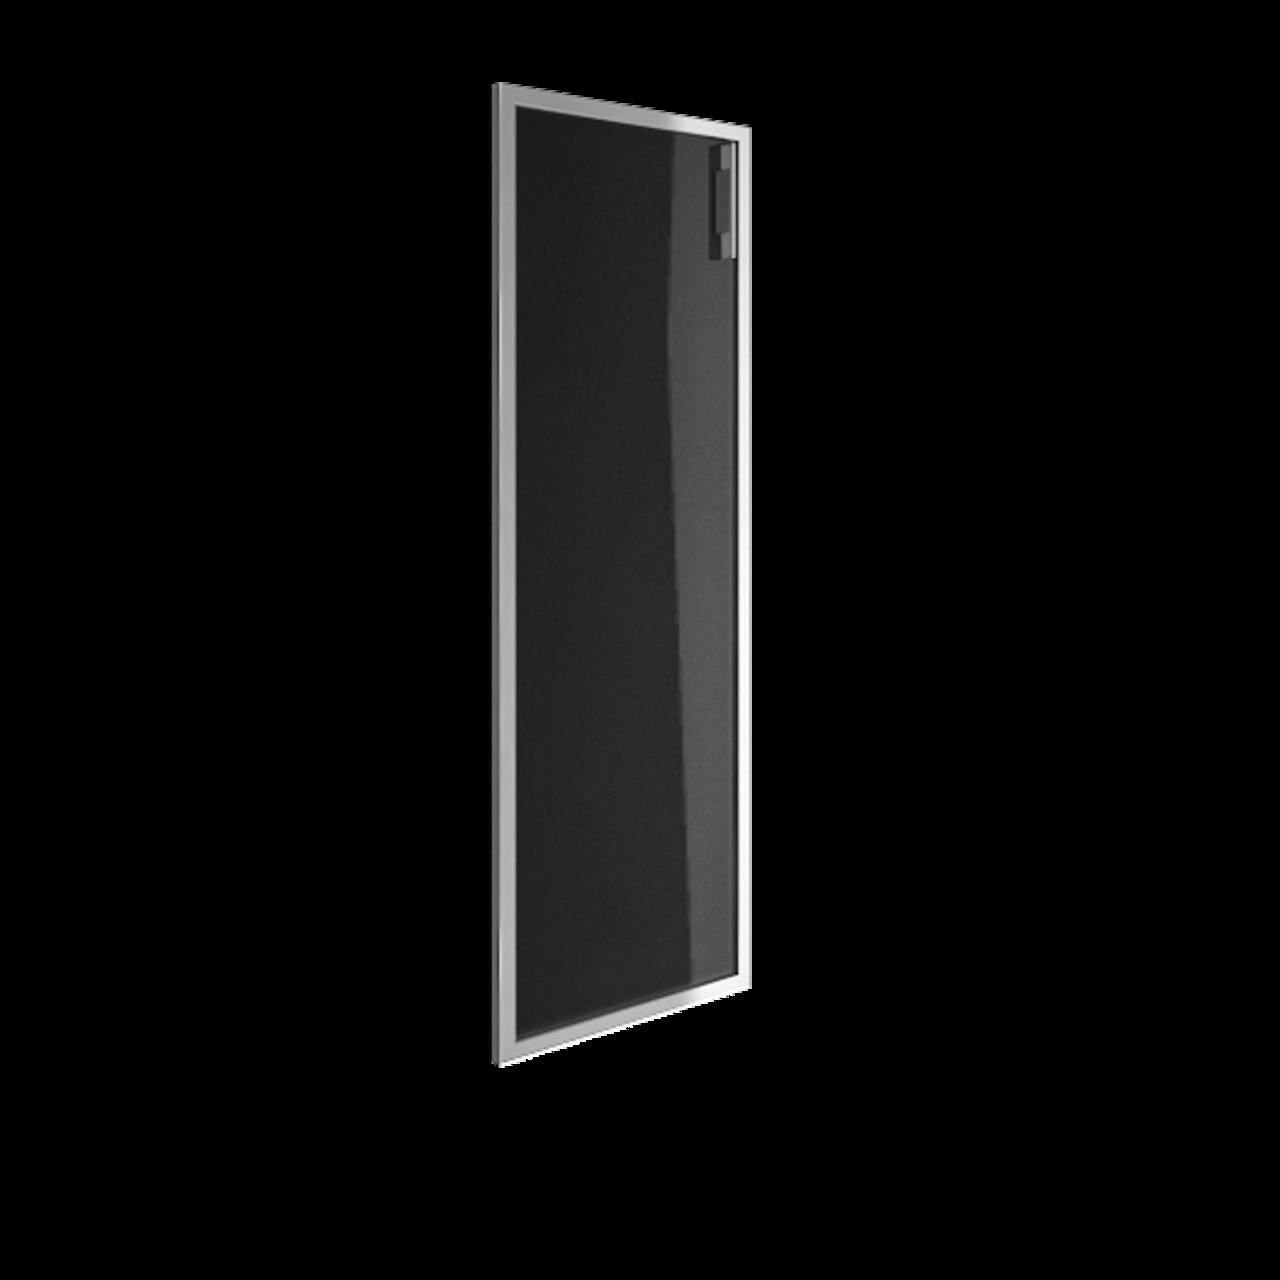 Дверь стекло в раме среднее Lacobel black левая - фото 4